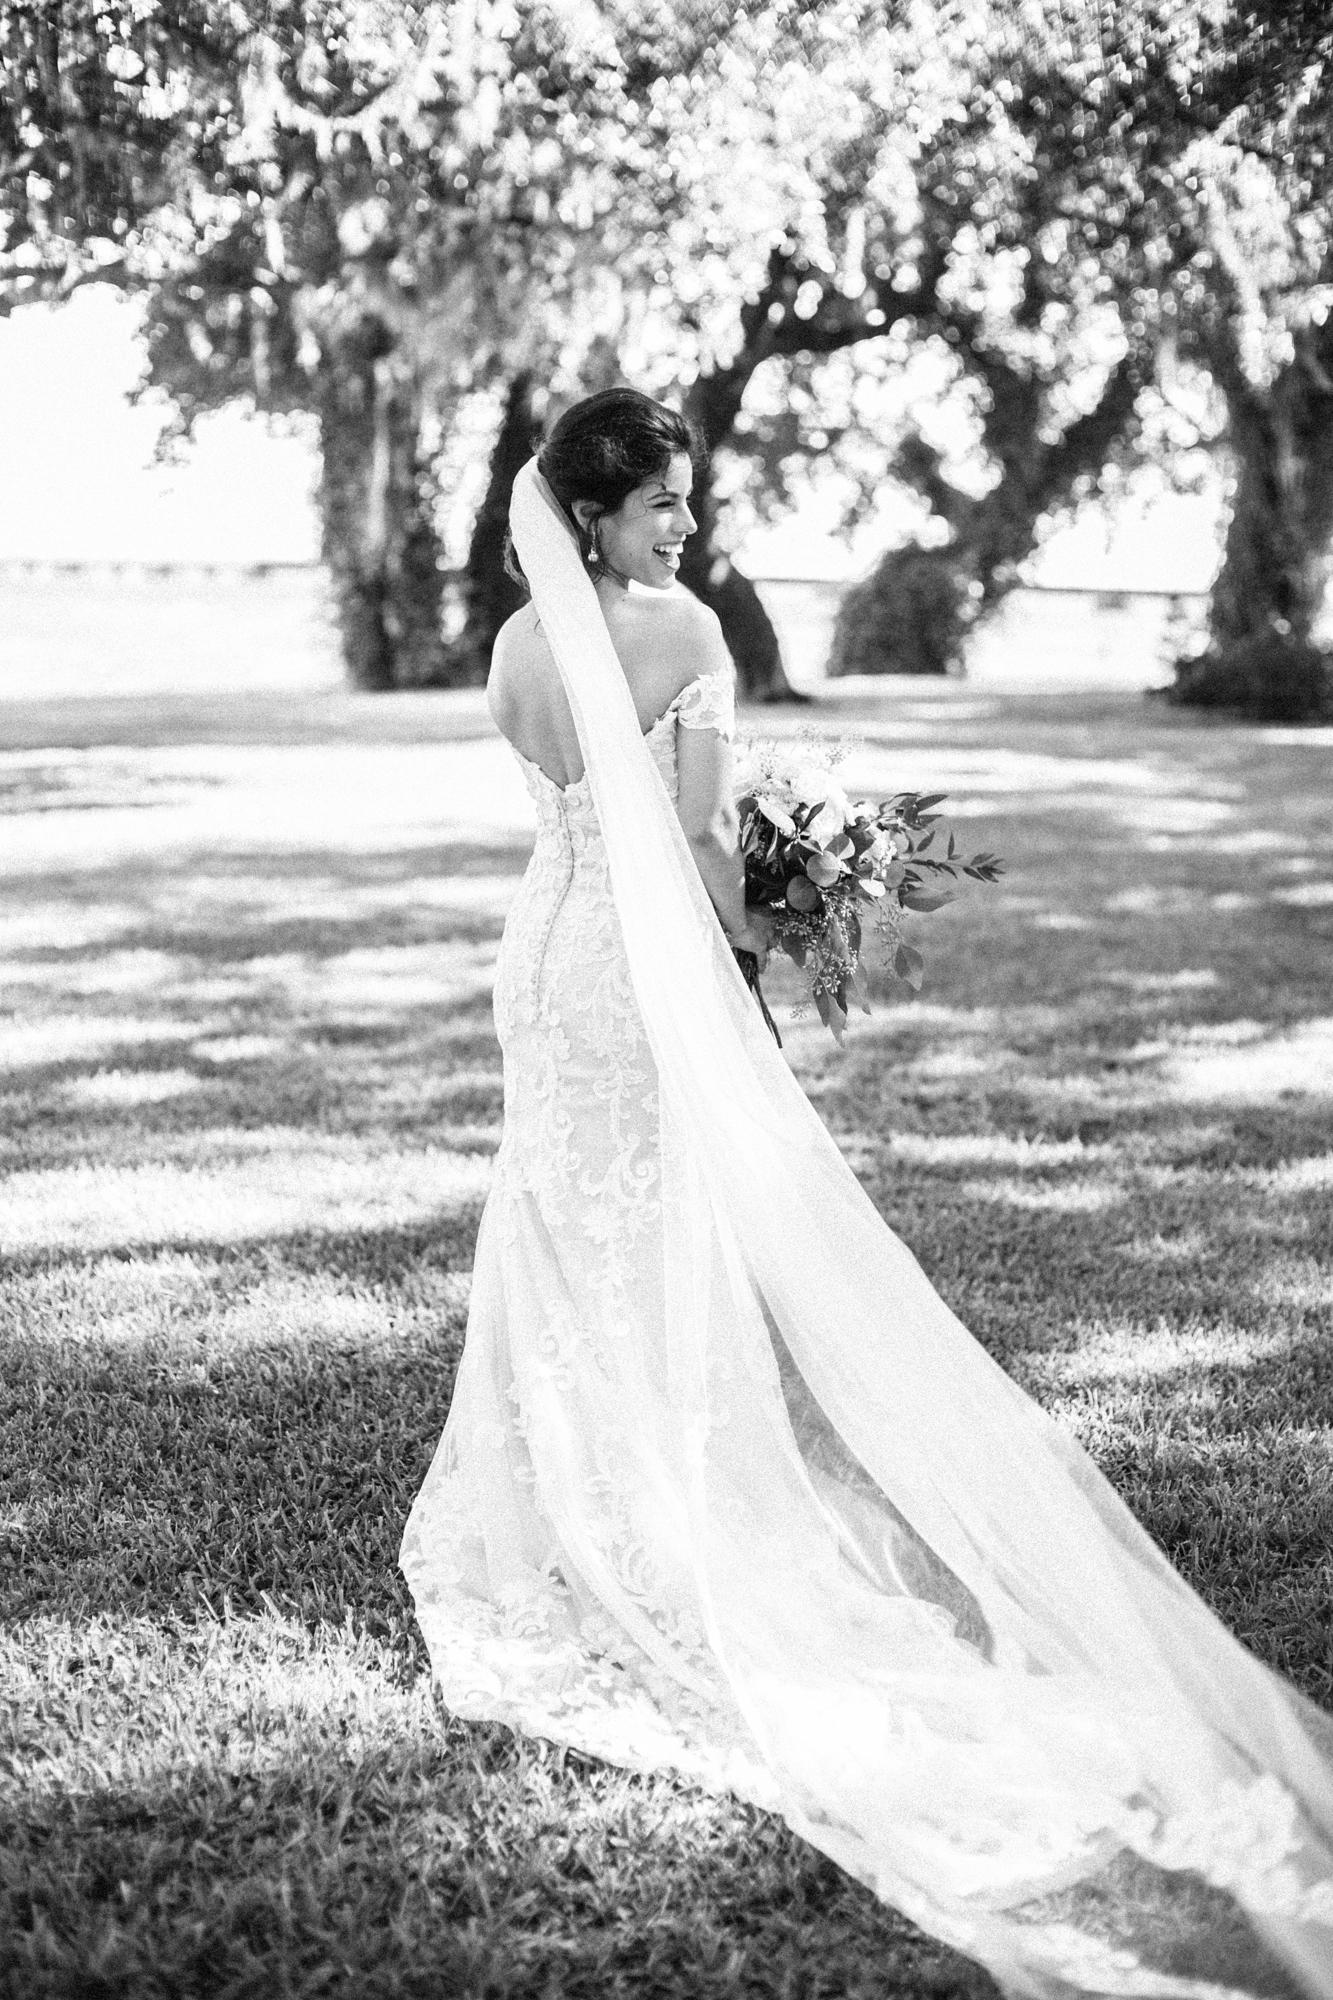 Gautier_Wedding_Photographer-49.jpg